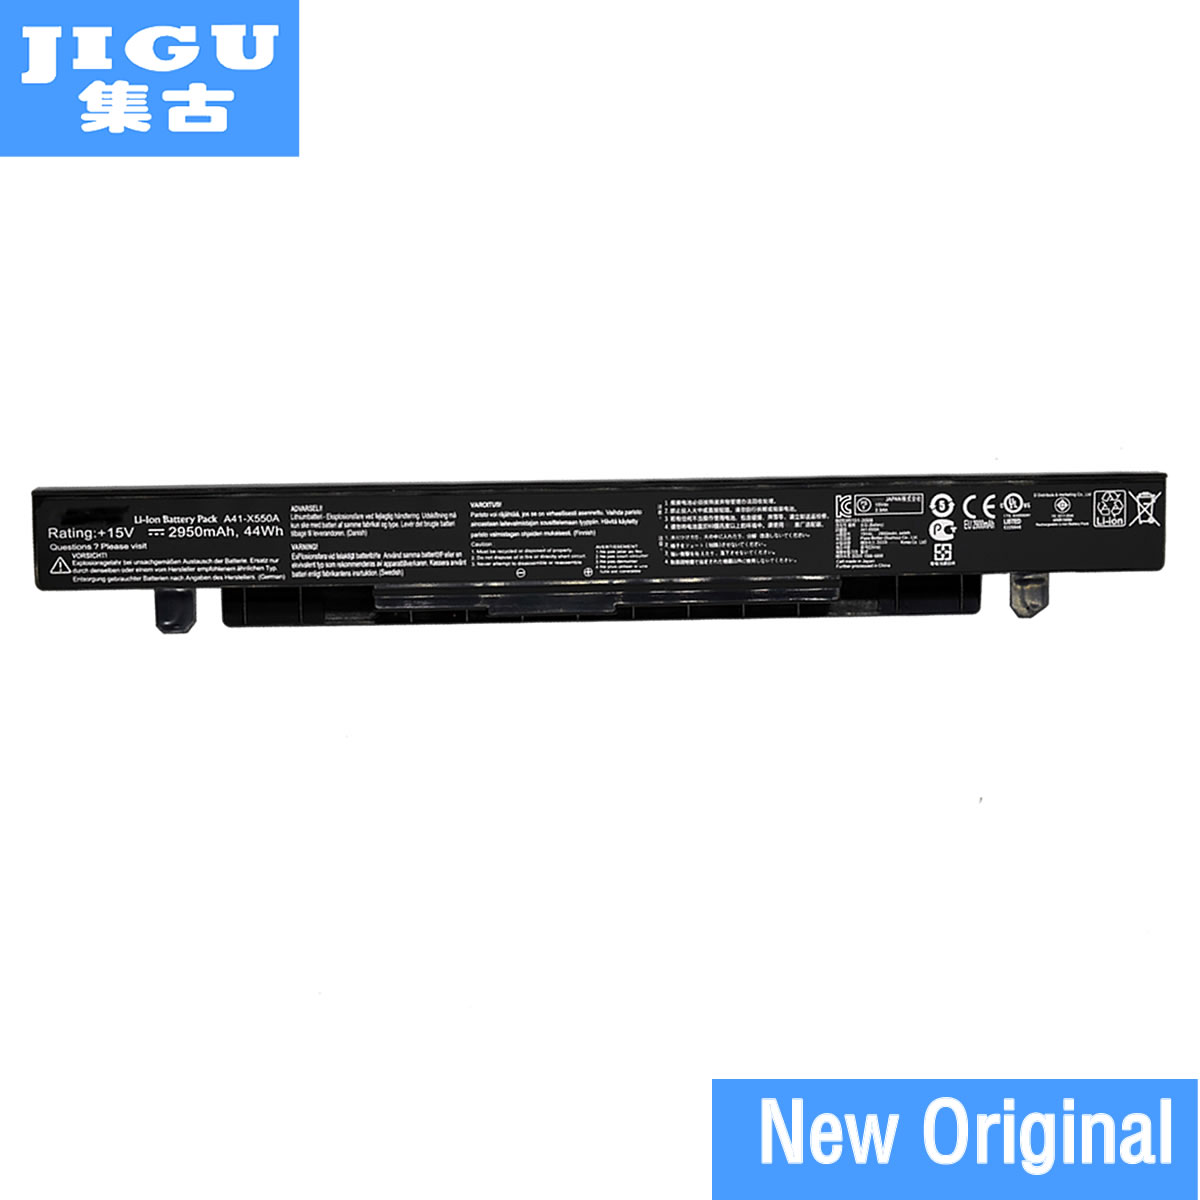 JIGU Original Laptop battery For ASUS A41-X550A A41-X550 A450 A450C A450CA X450 X450LC X450VB X450VC X550 X550C X550CA Series jigu laptop battery a41 x550a a41 x550 for asus a450l a450c x550c x550b x550v x550d page 2